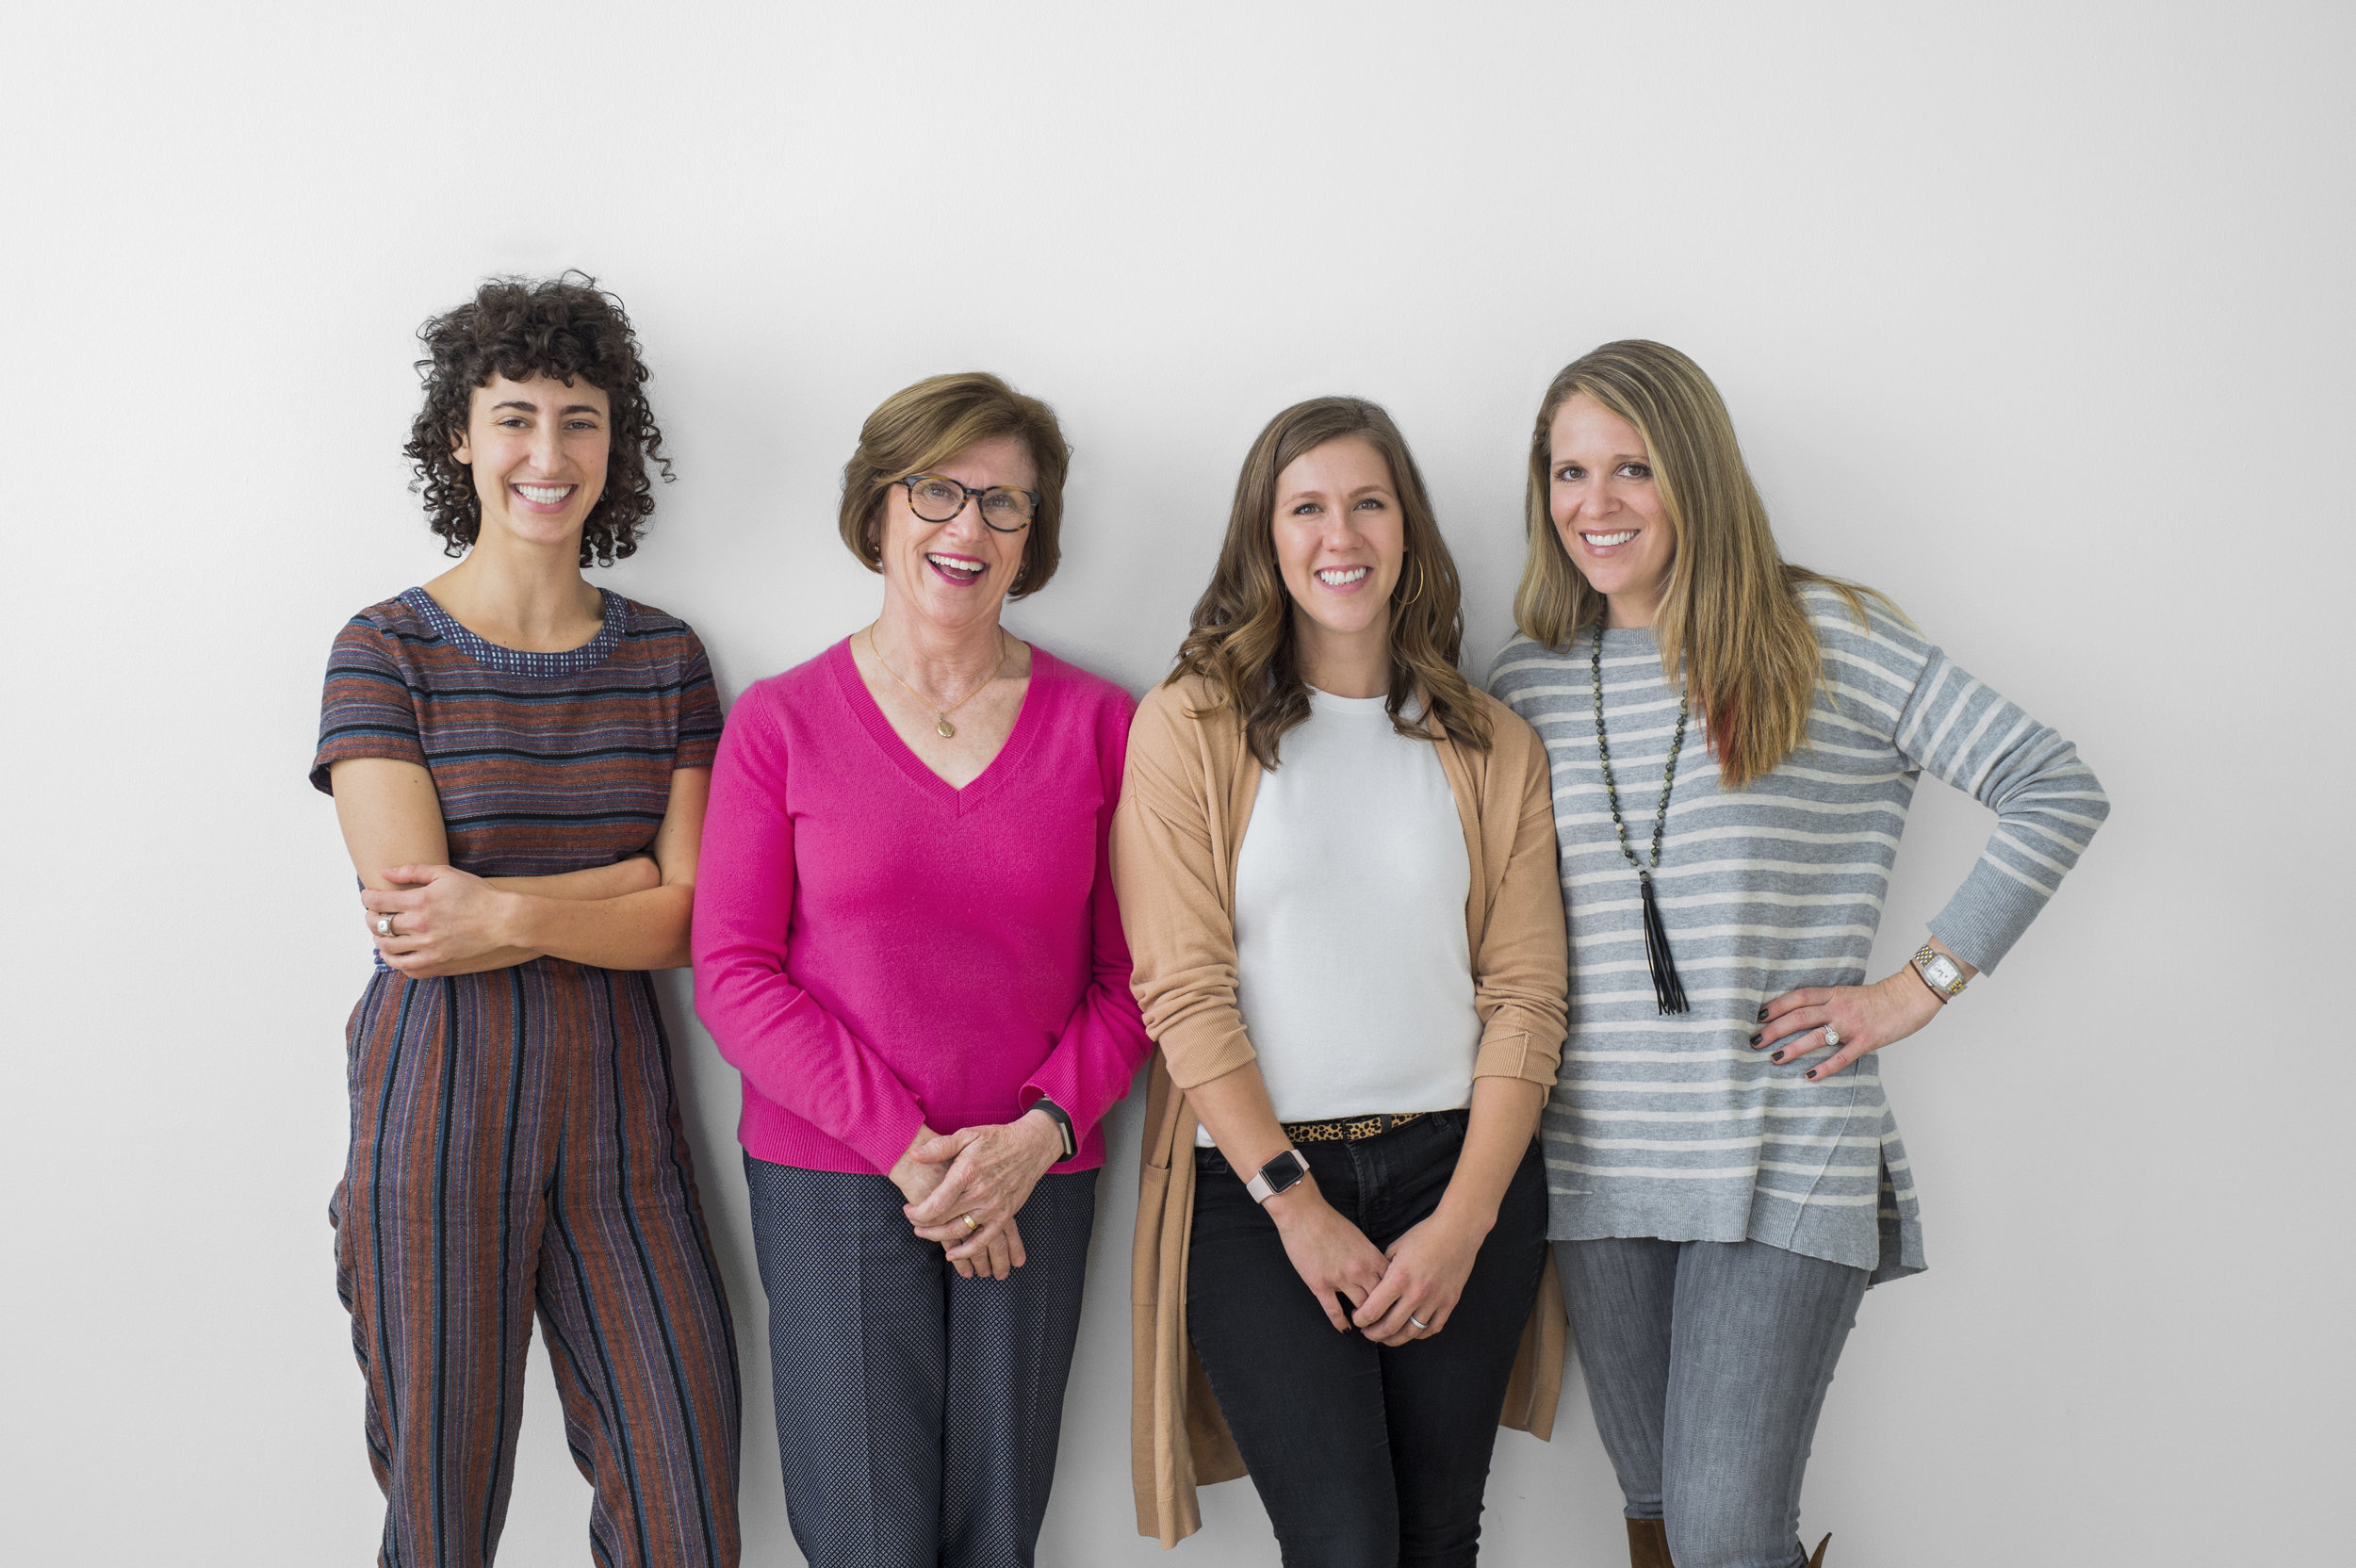 The JOC Lactation Consultant Team (left to right): Francesca Reinisch, Jane O'Connor, Jamie Mayer, Vanessa Prinz (photo by Shalimar Beekman)